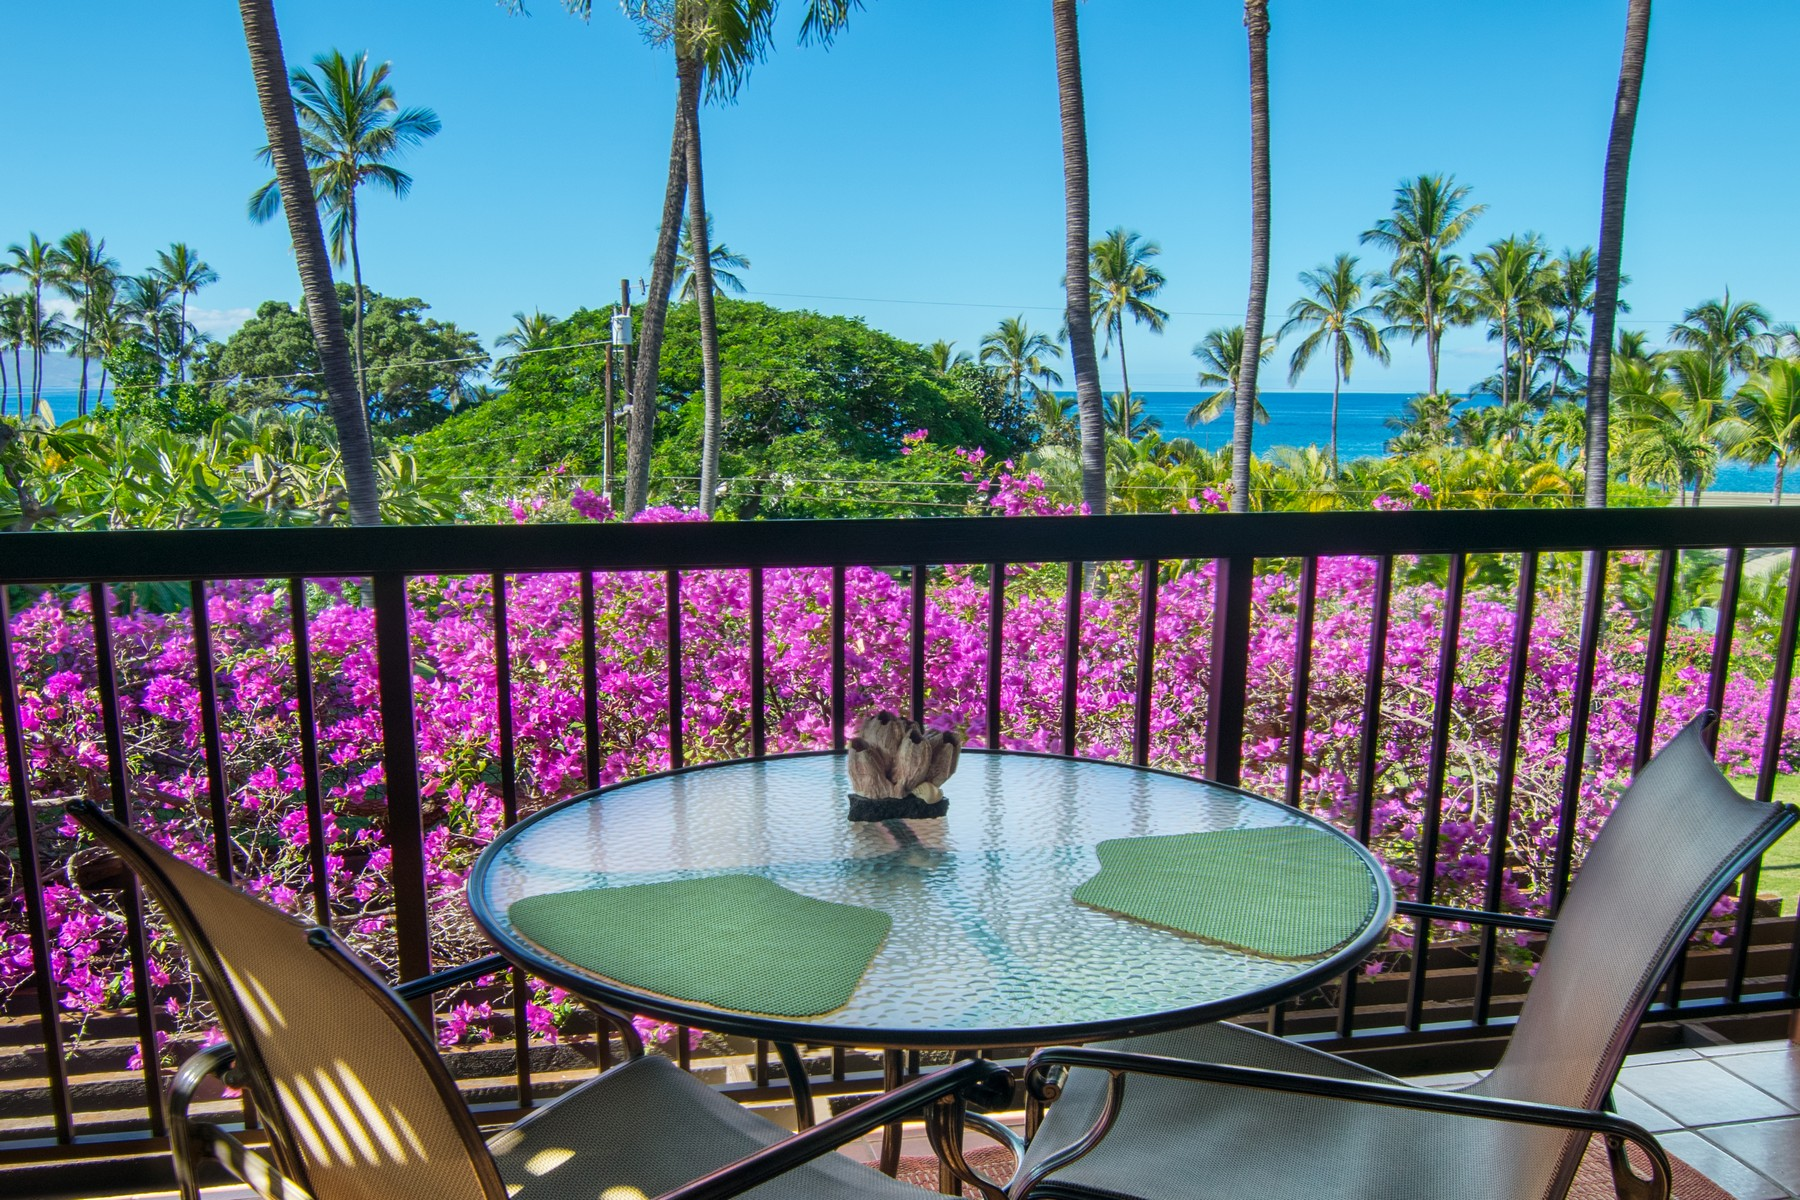 Квартира для того Продажа на Just a Short Stroll to Keawekapu Beach 3300 Wailea Alanui Drive, Wailea Ekahi 21F Wailea, Гавайи 96753 Соединенные Штаты